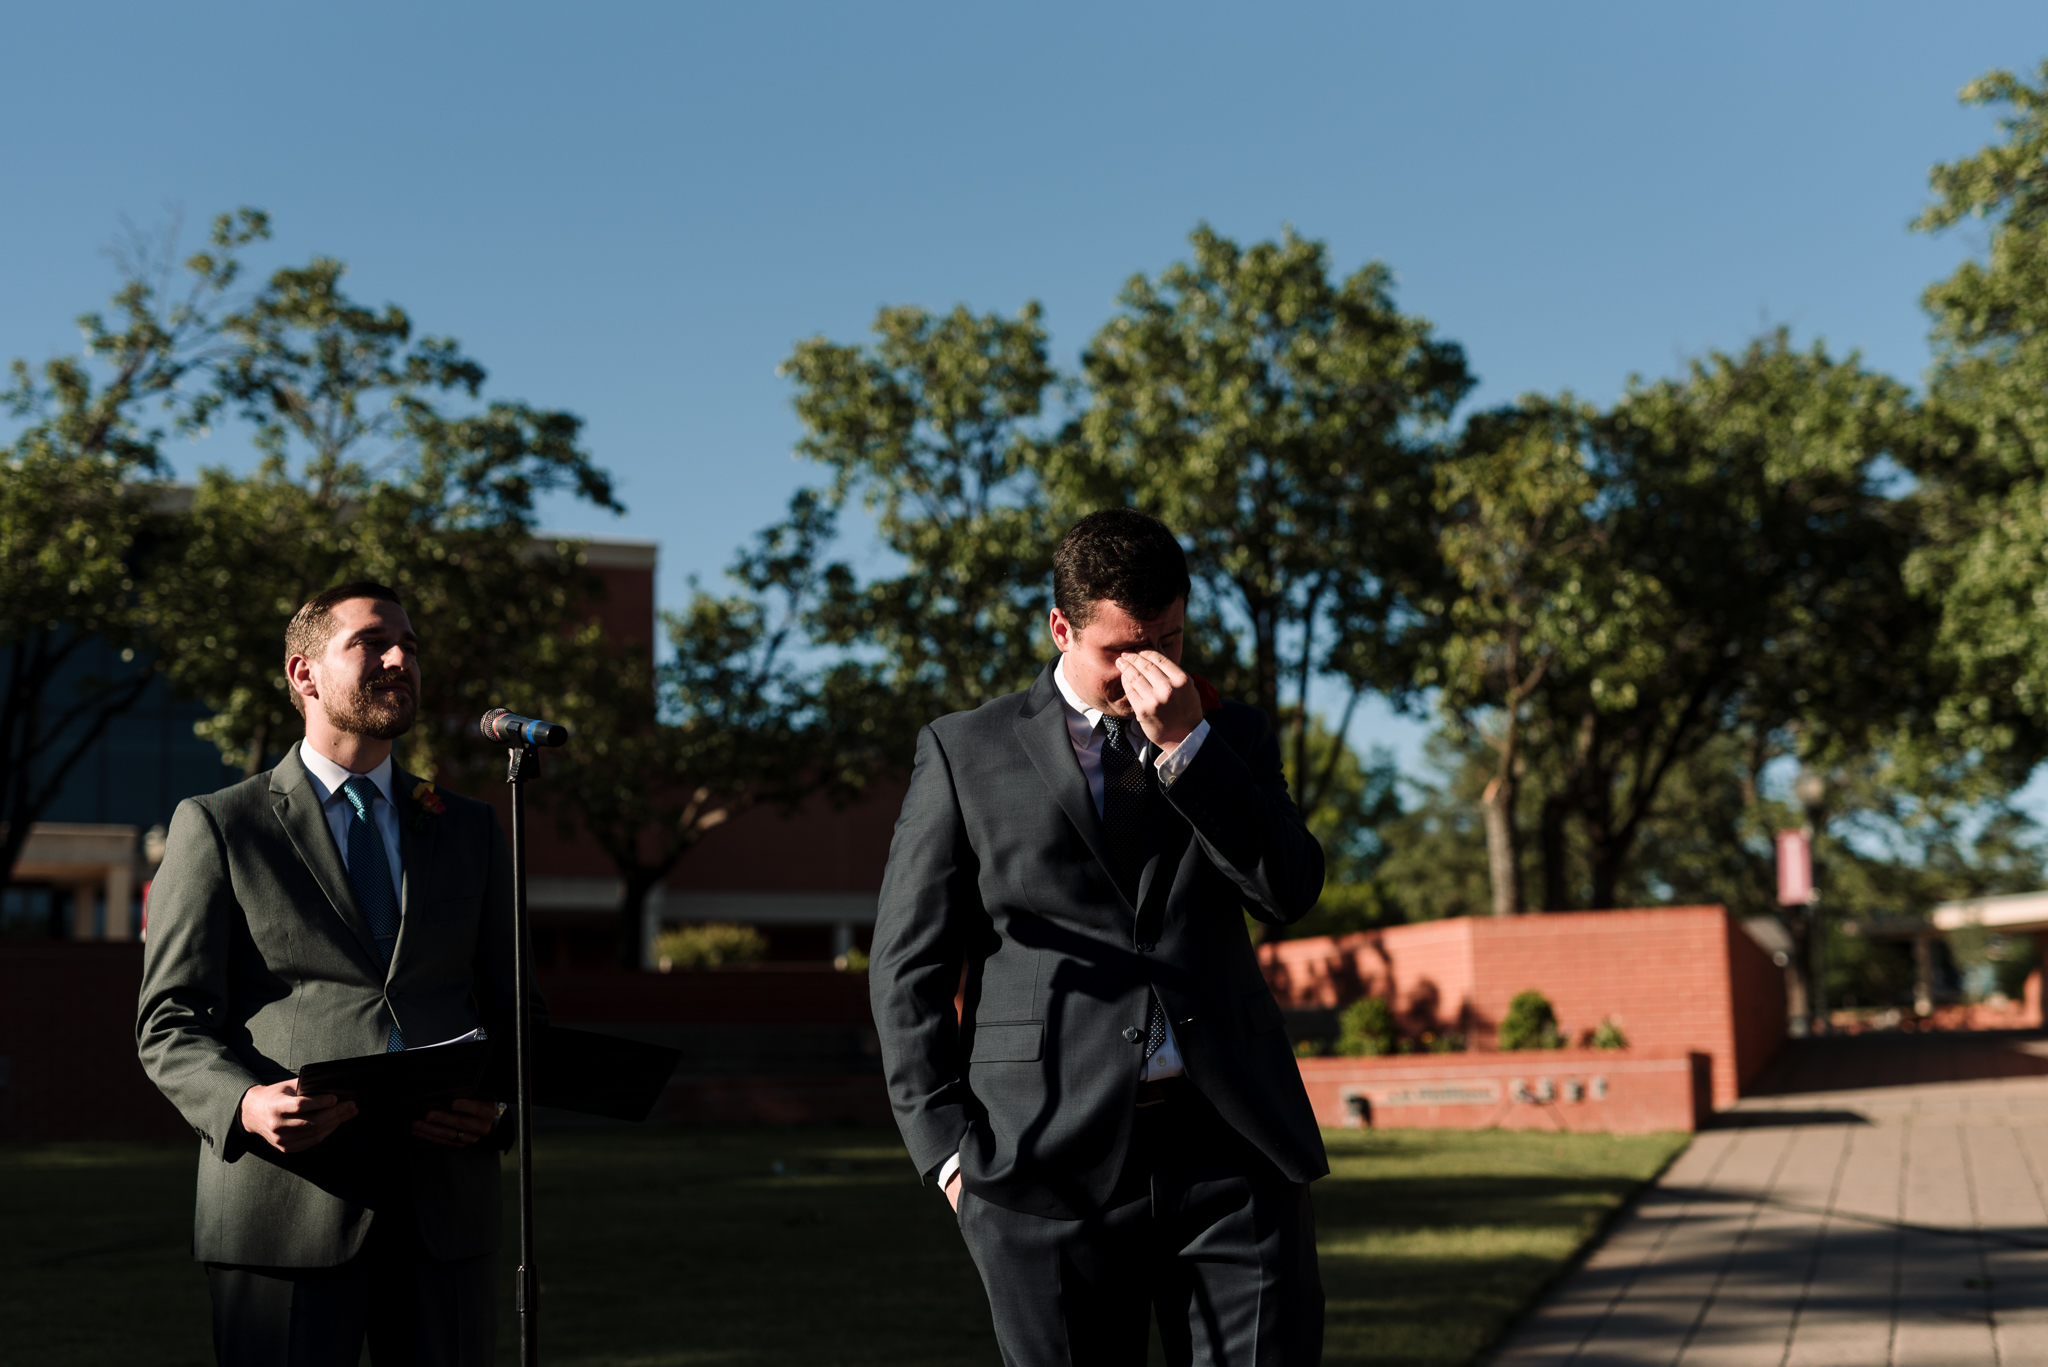 Oklahoma-Christian-University-Wedding-8160.jpg